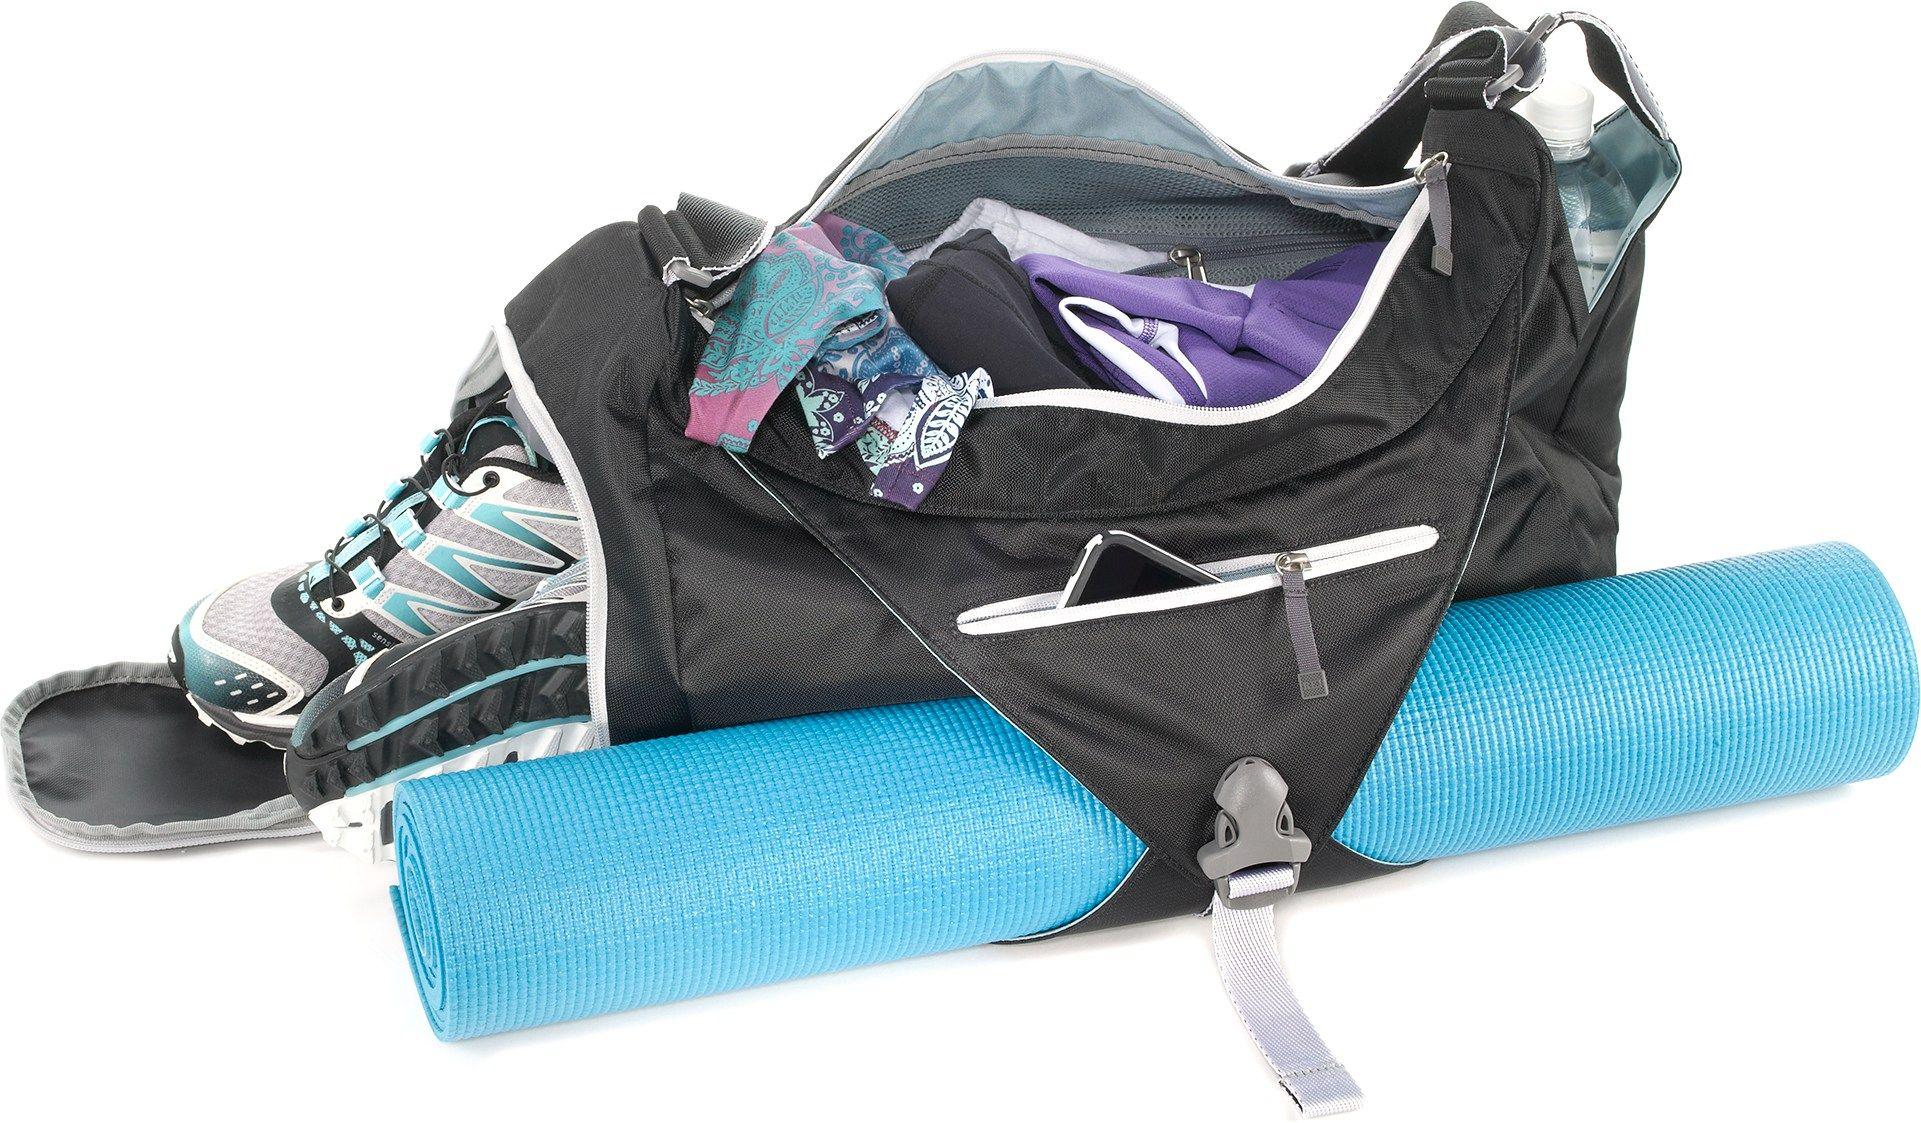 REI Balance Gym Bag - Women s  59.50 Like the shoe section 55d23e0b64201